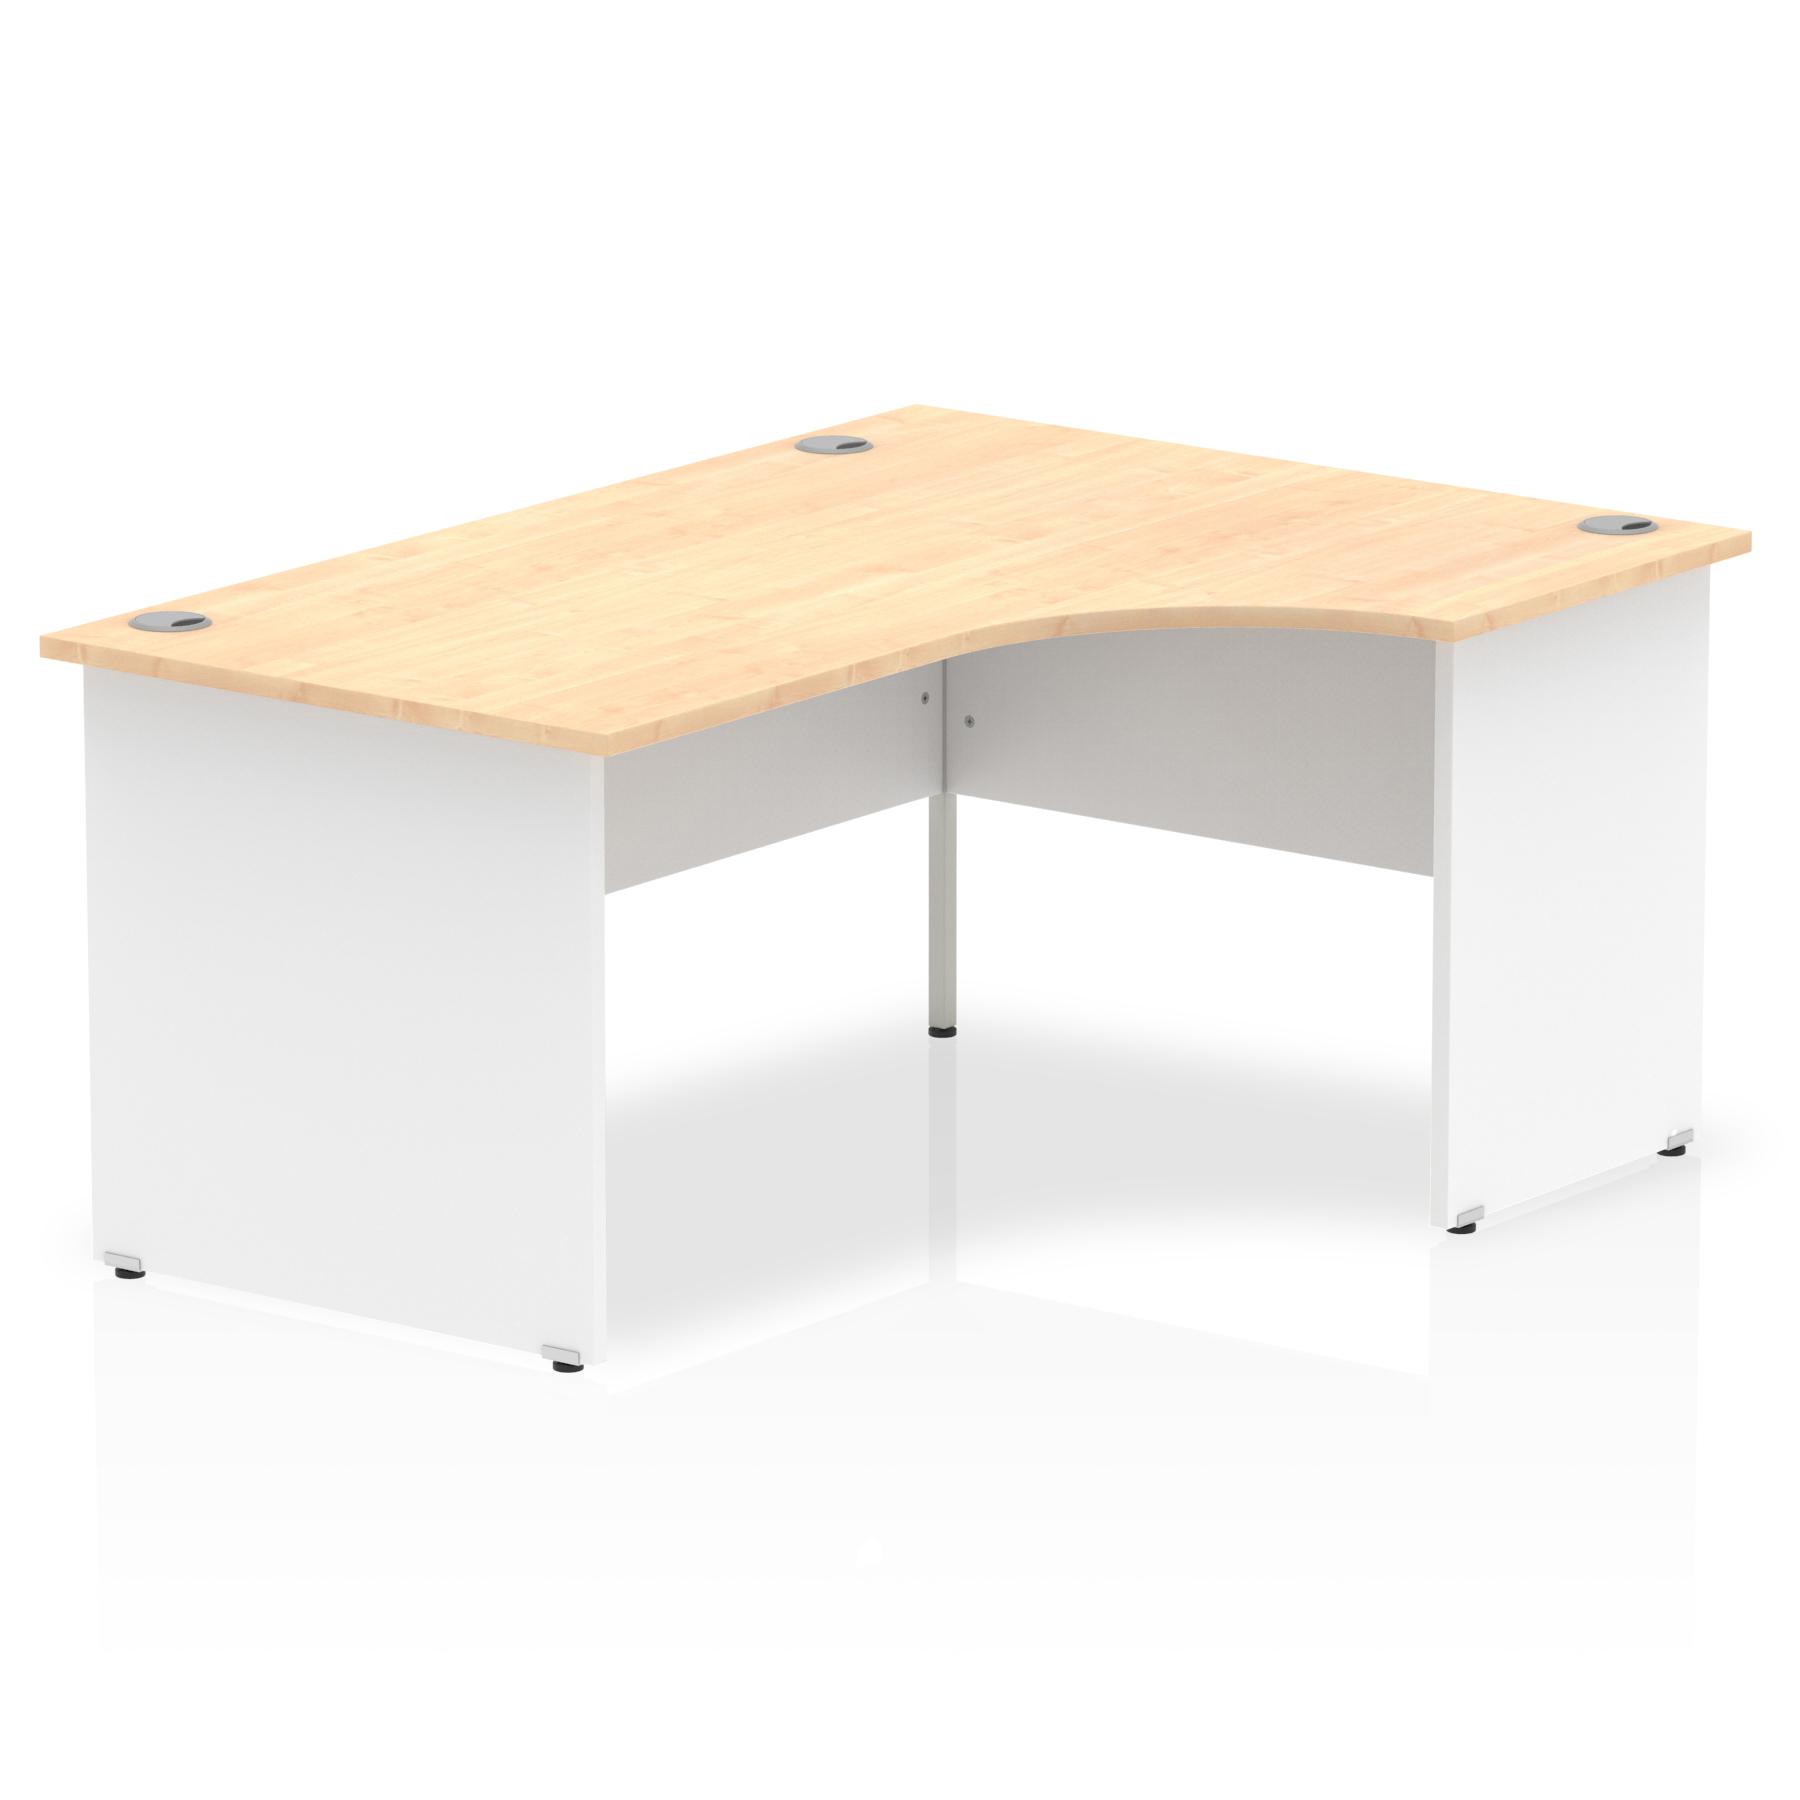 Trexus Desk Crescent Right Hand Panel End 1600x800mm Maple Top White Panels Ref TT000115